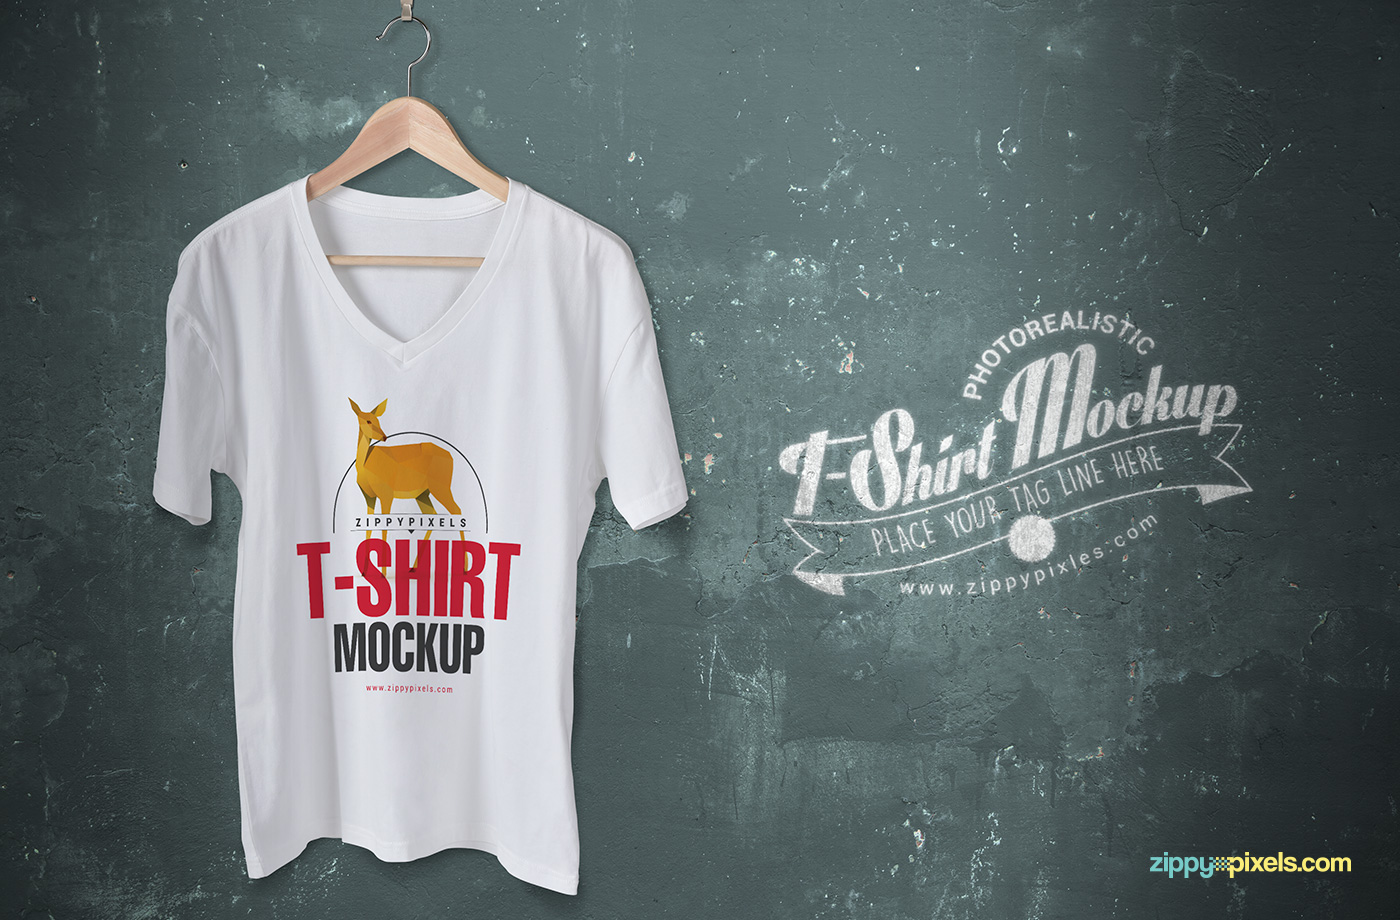 free freebie Mockup psd tshirt mockup v-neck tshirt psd mockup t shirt design v neck tee Clothing Branding design Apparel Design customizable tshirt